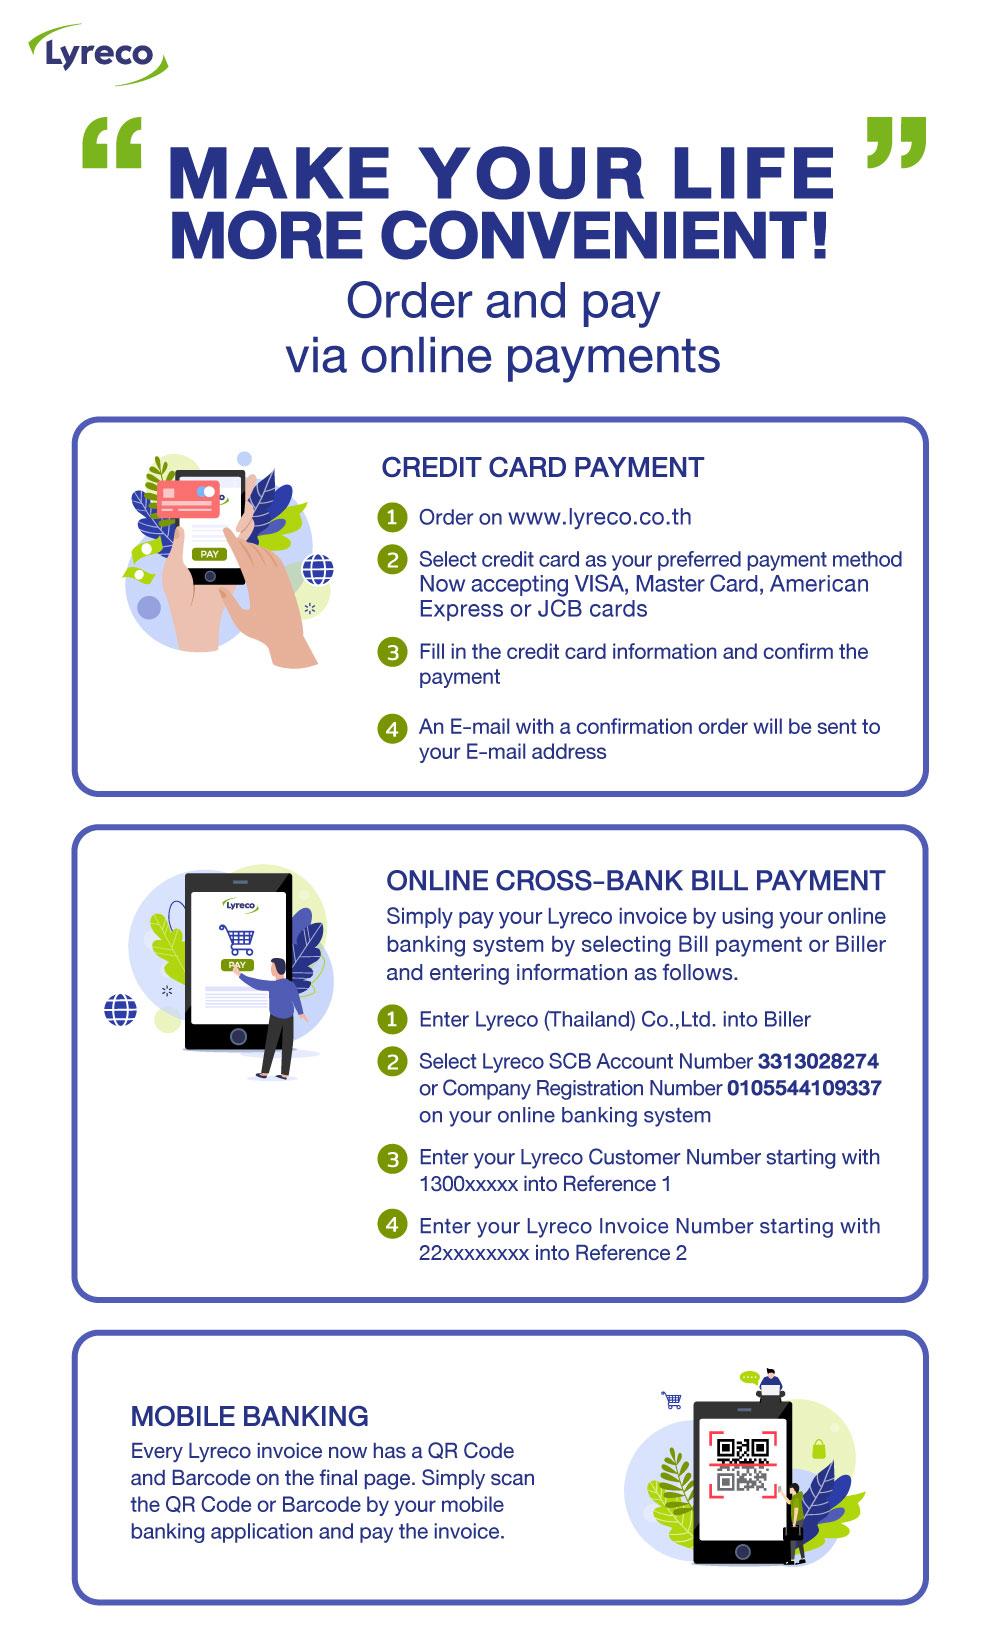 Lyreco Online Payment Channels